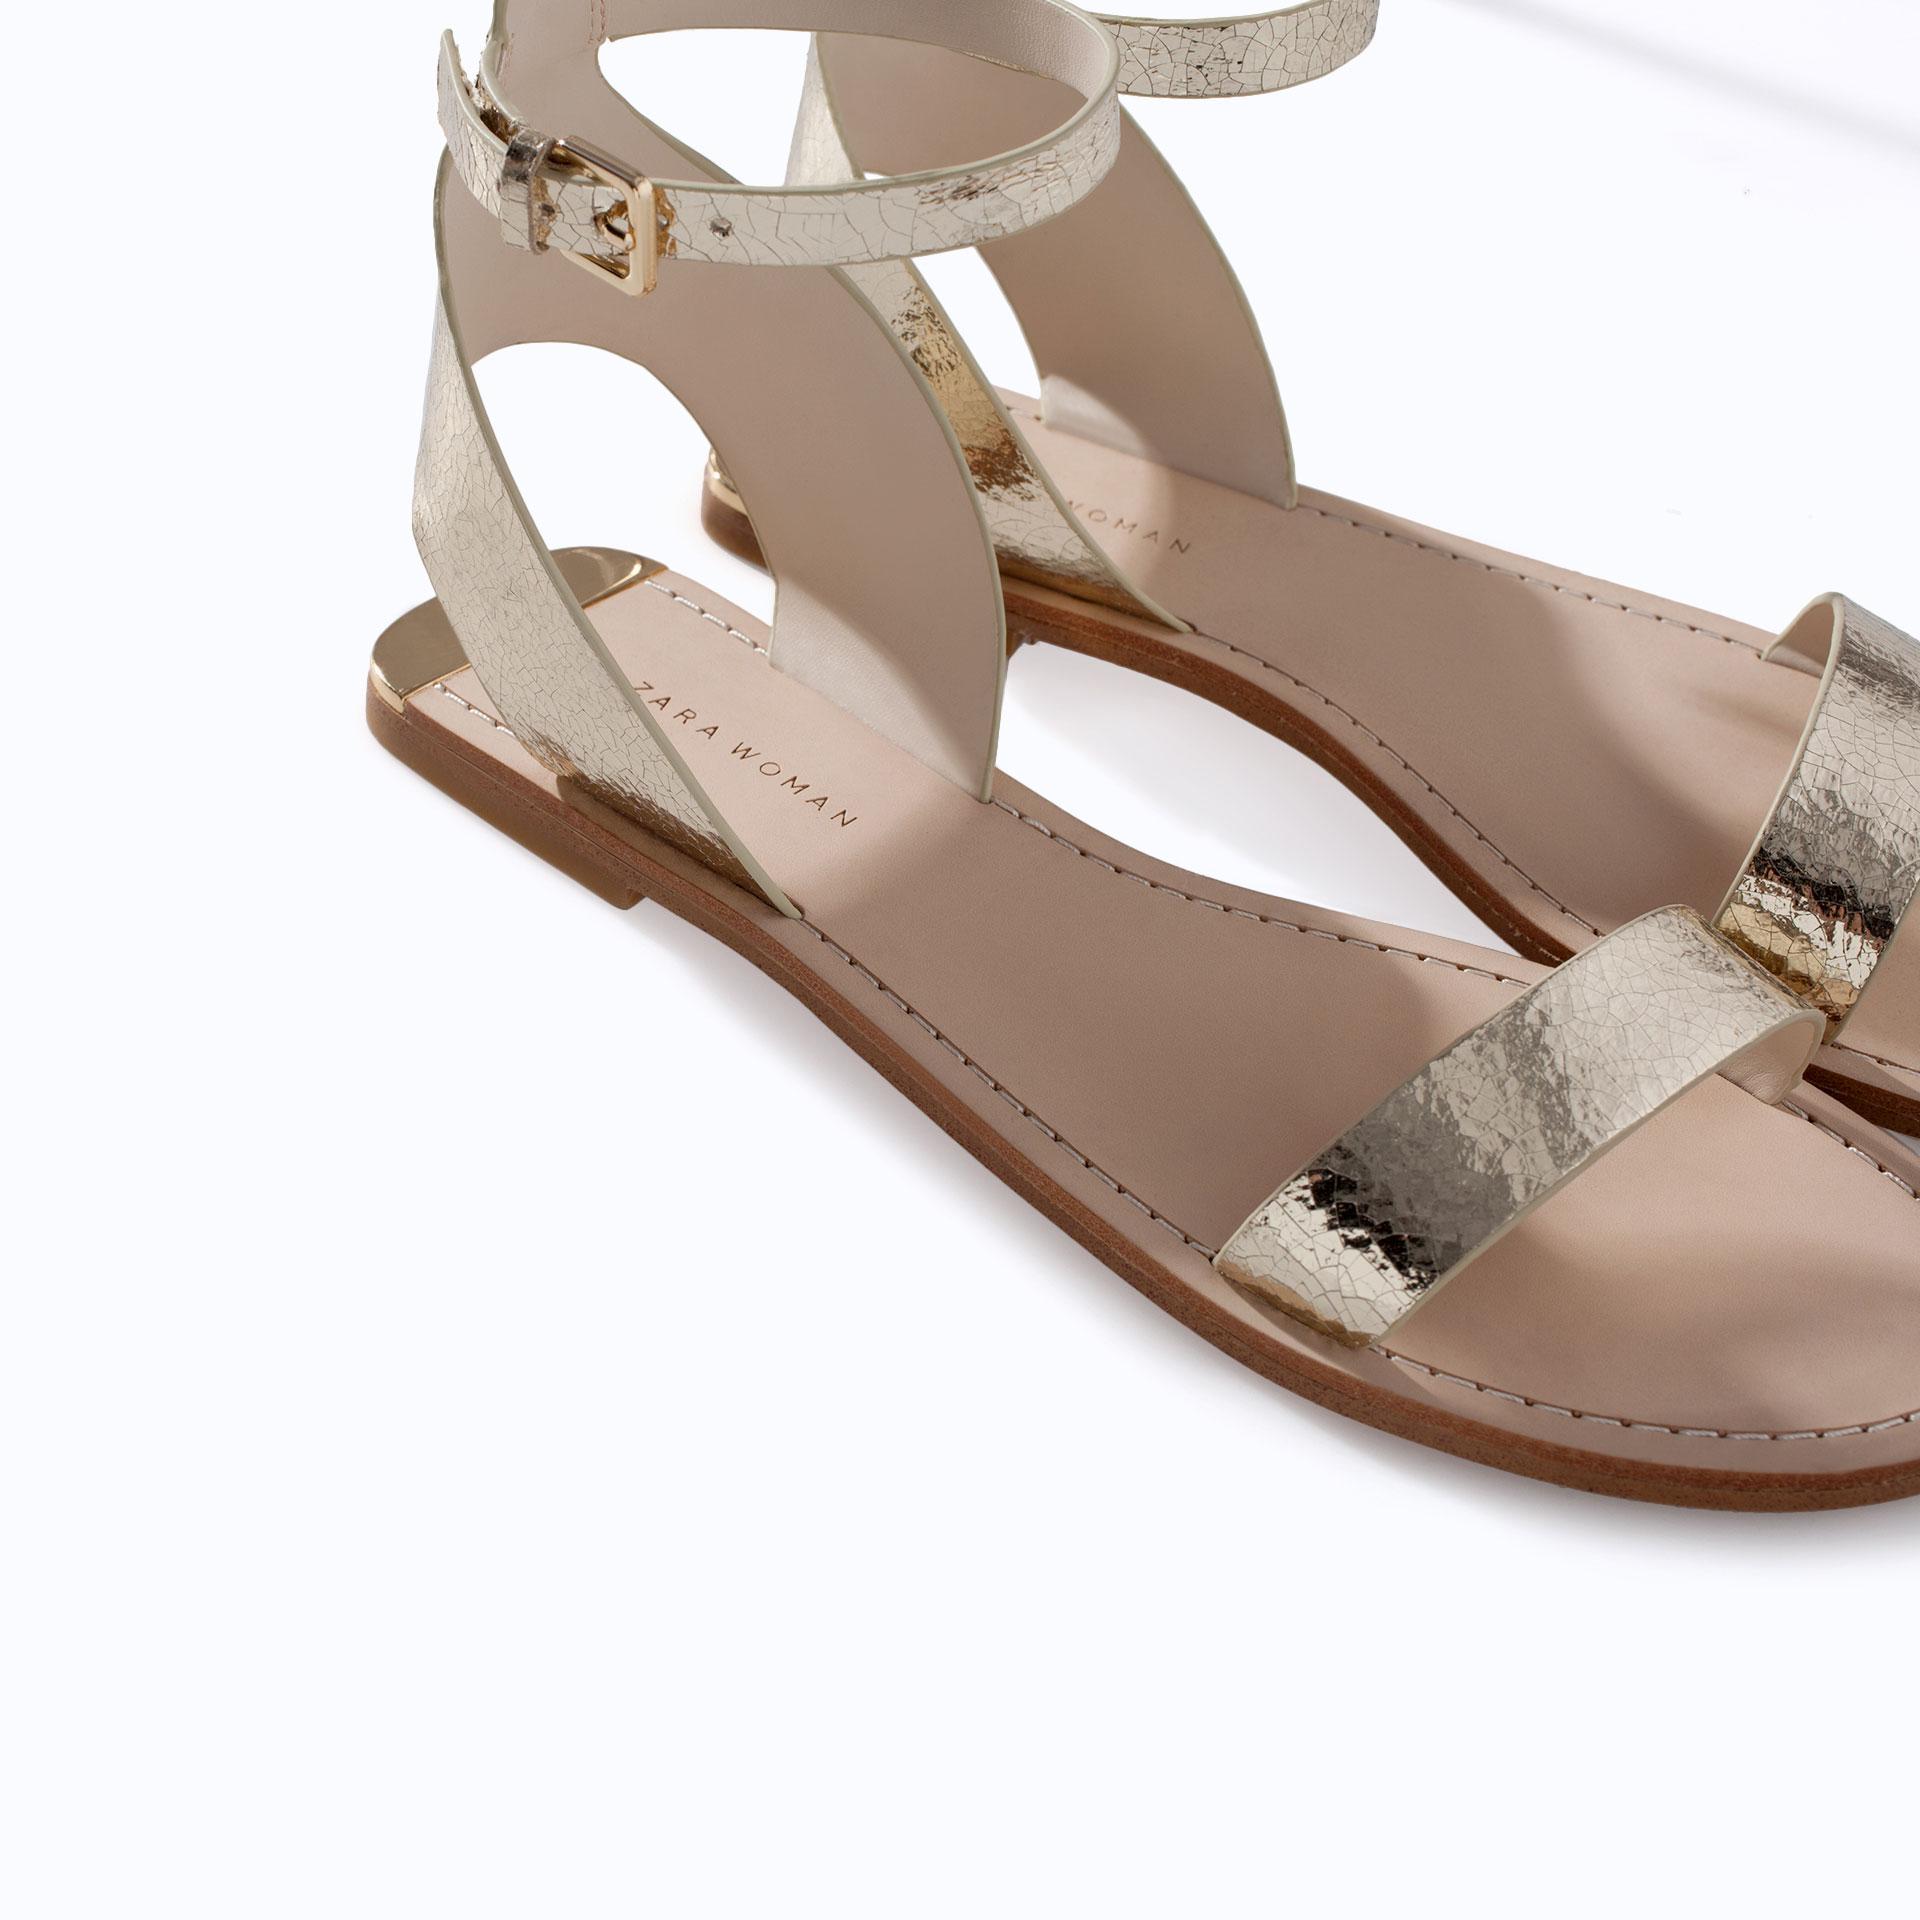 Metallic Blue Flat Shoes